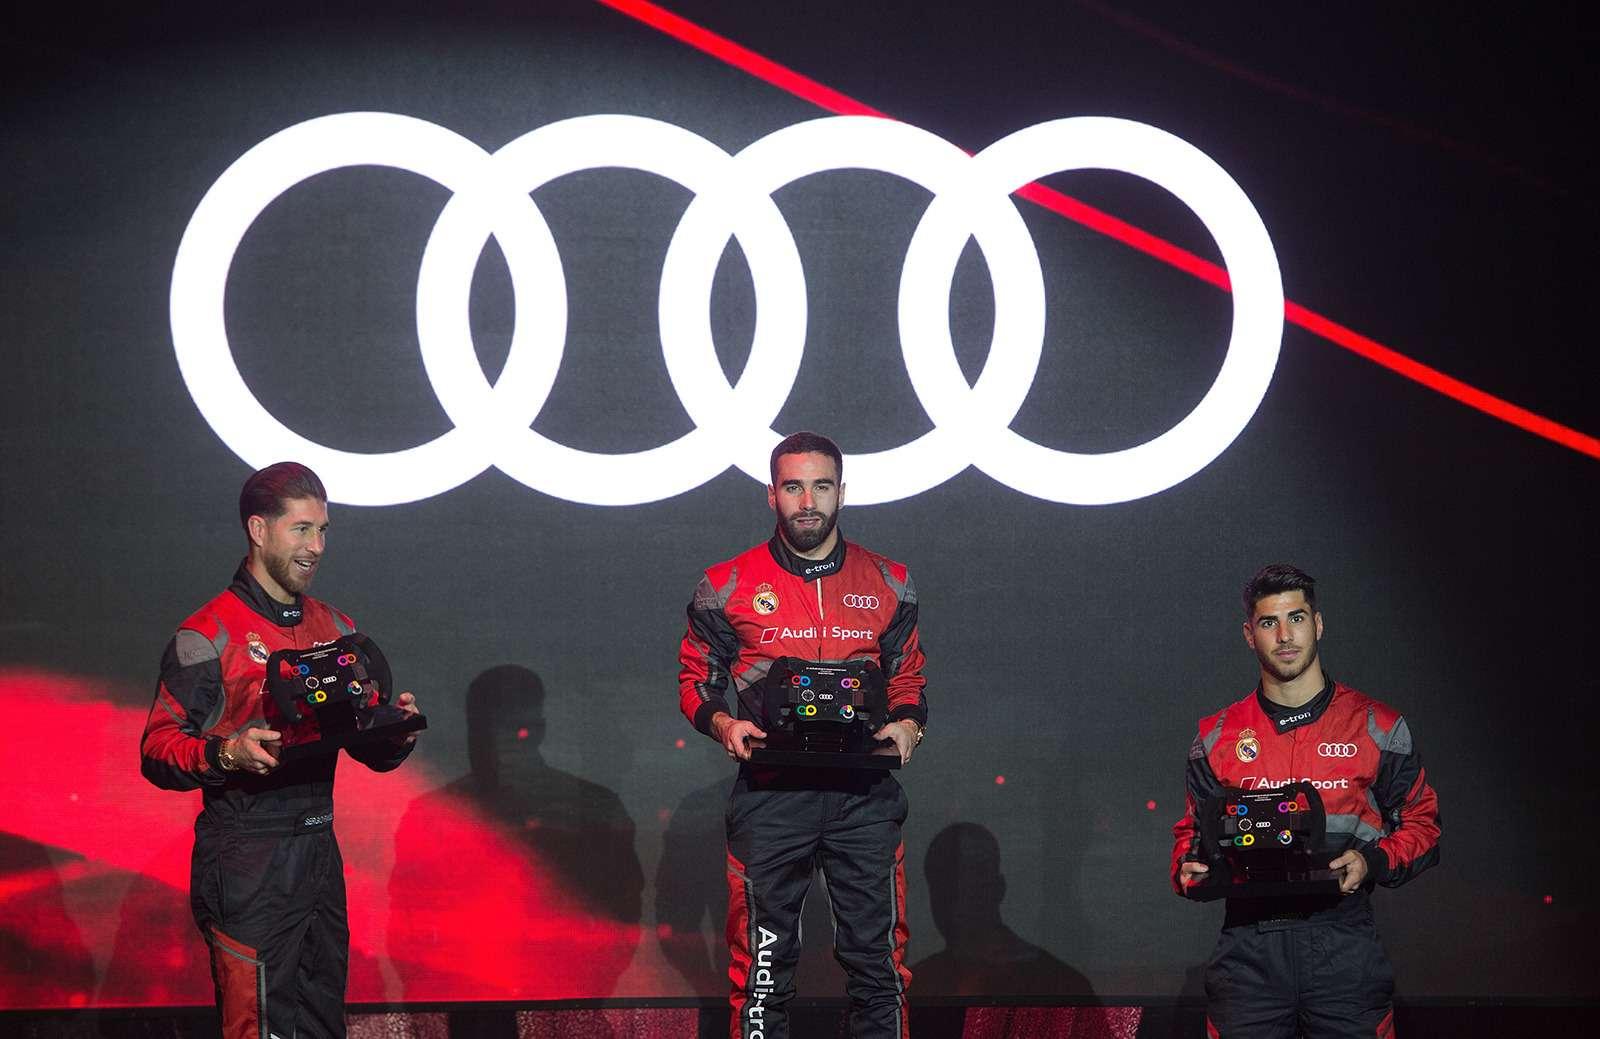 Вотэто спонсор! Audi раздала футболистам «Реала» машины— фото 819838